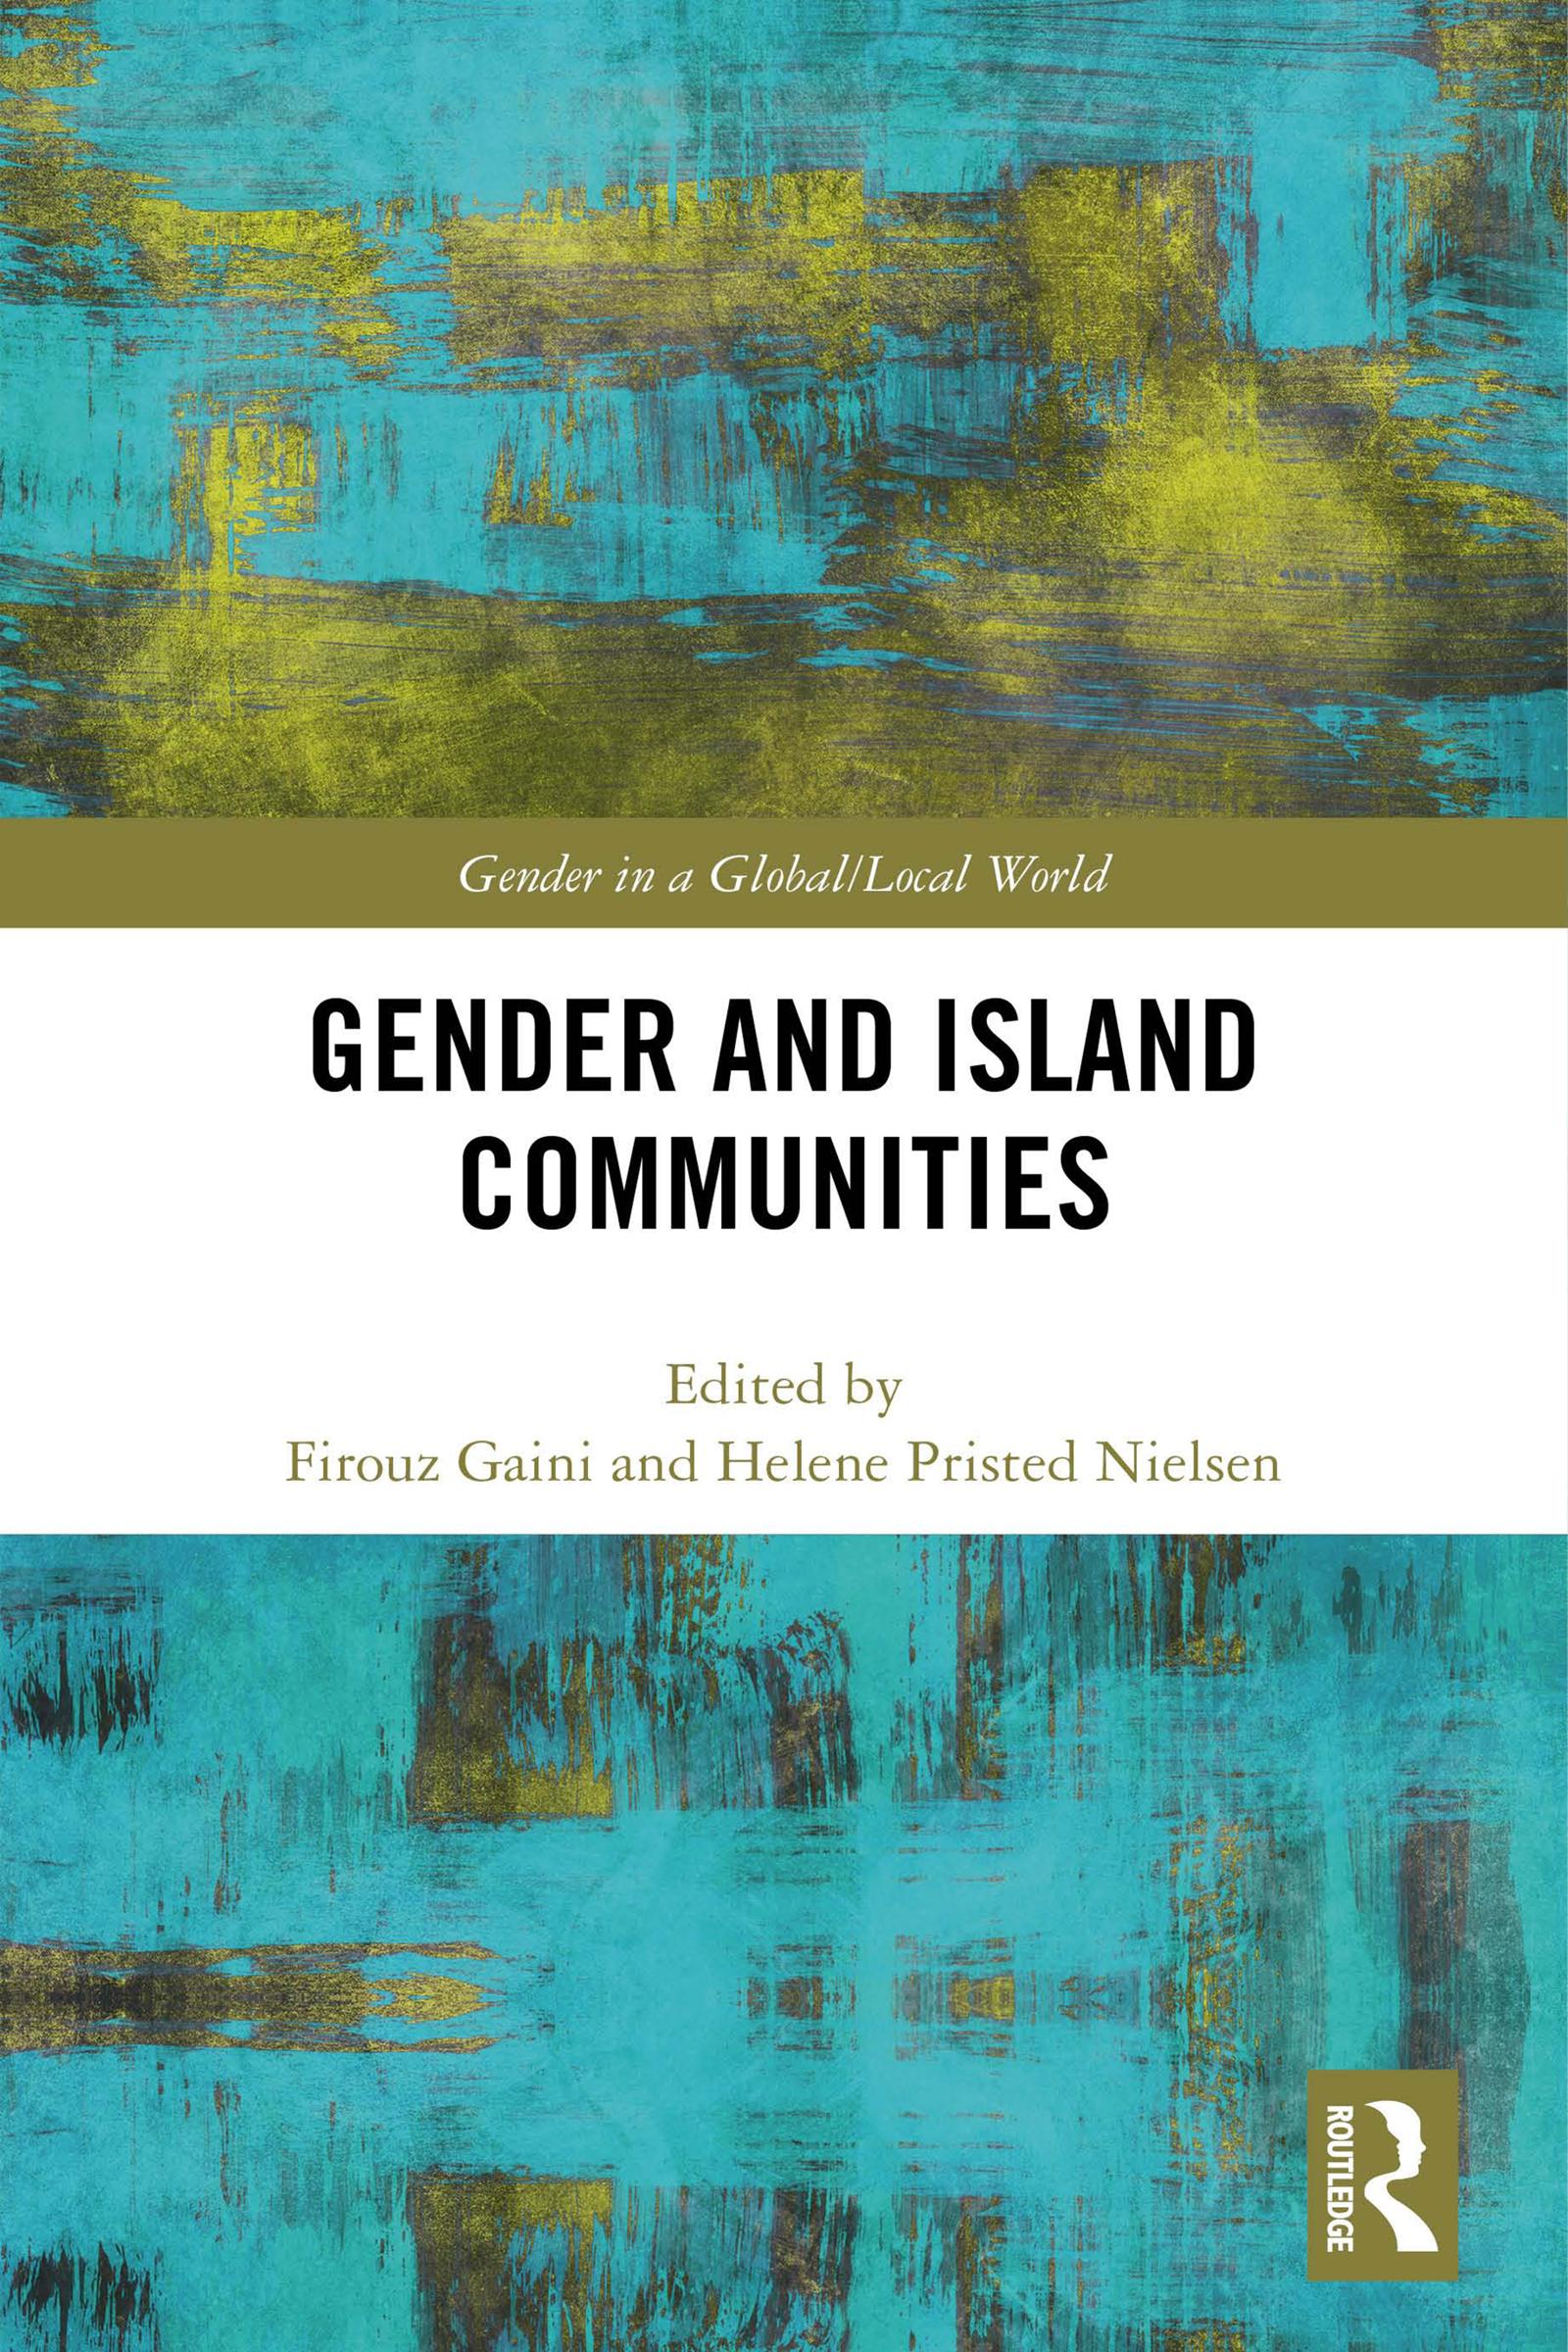 Gender and Island Communities